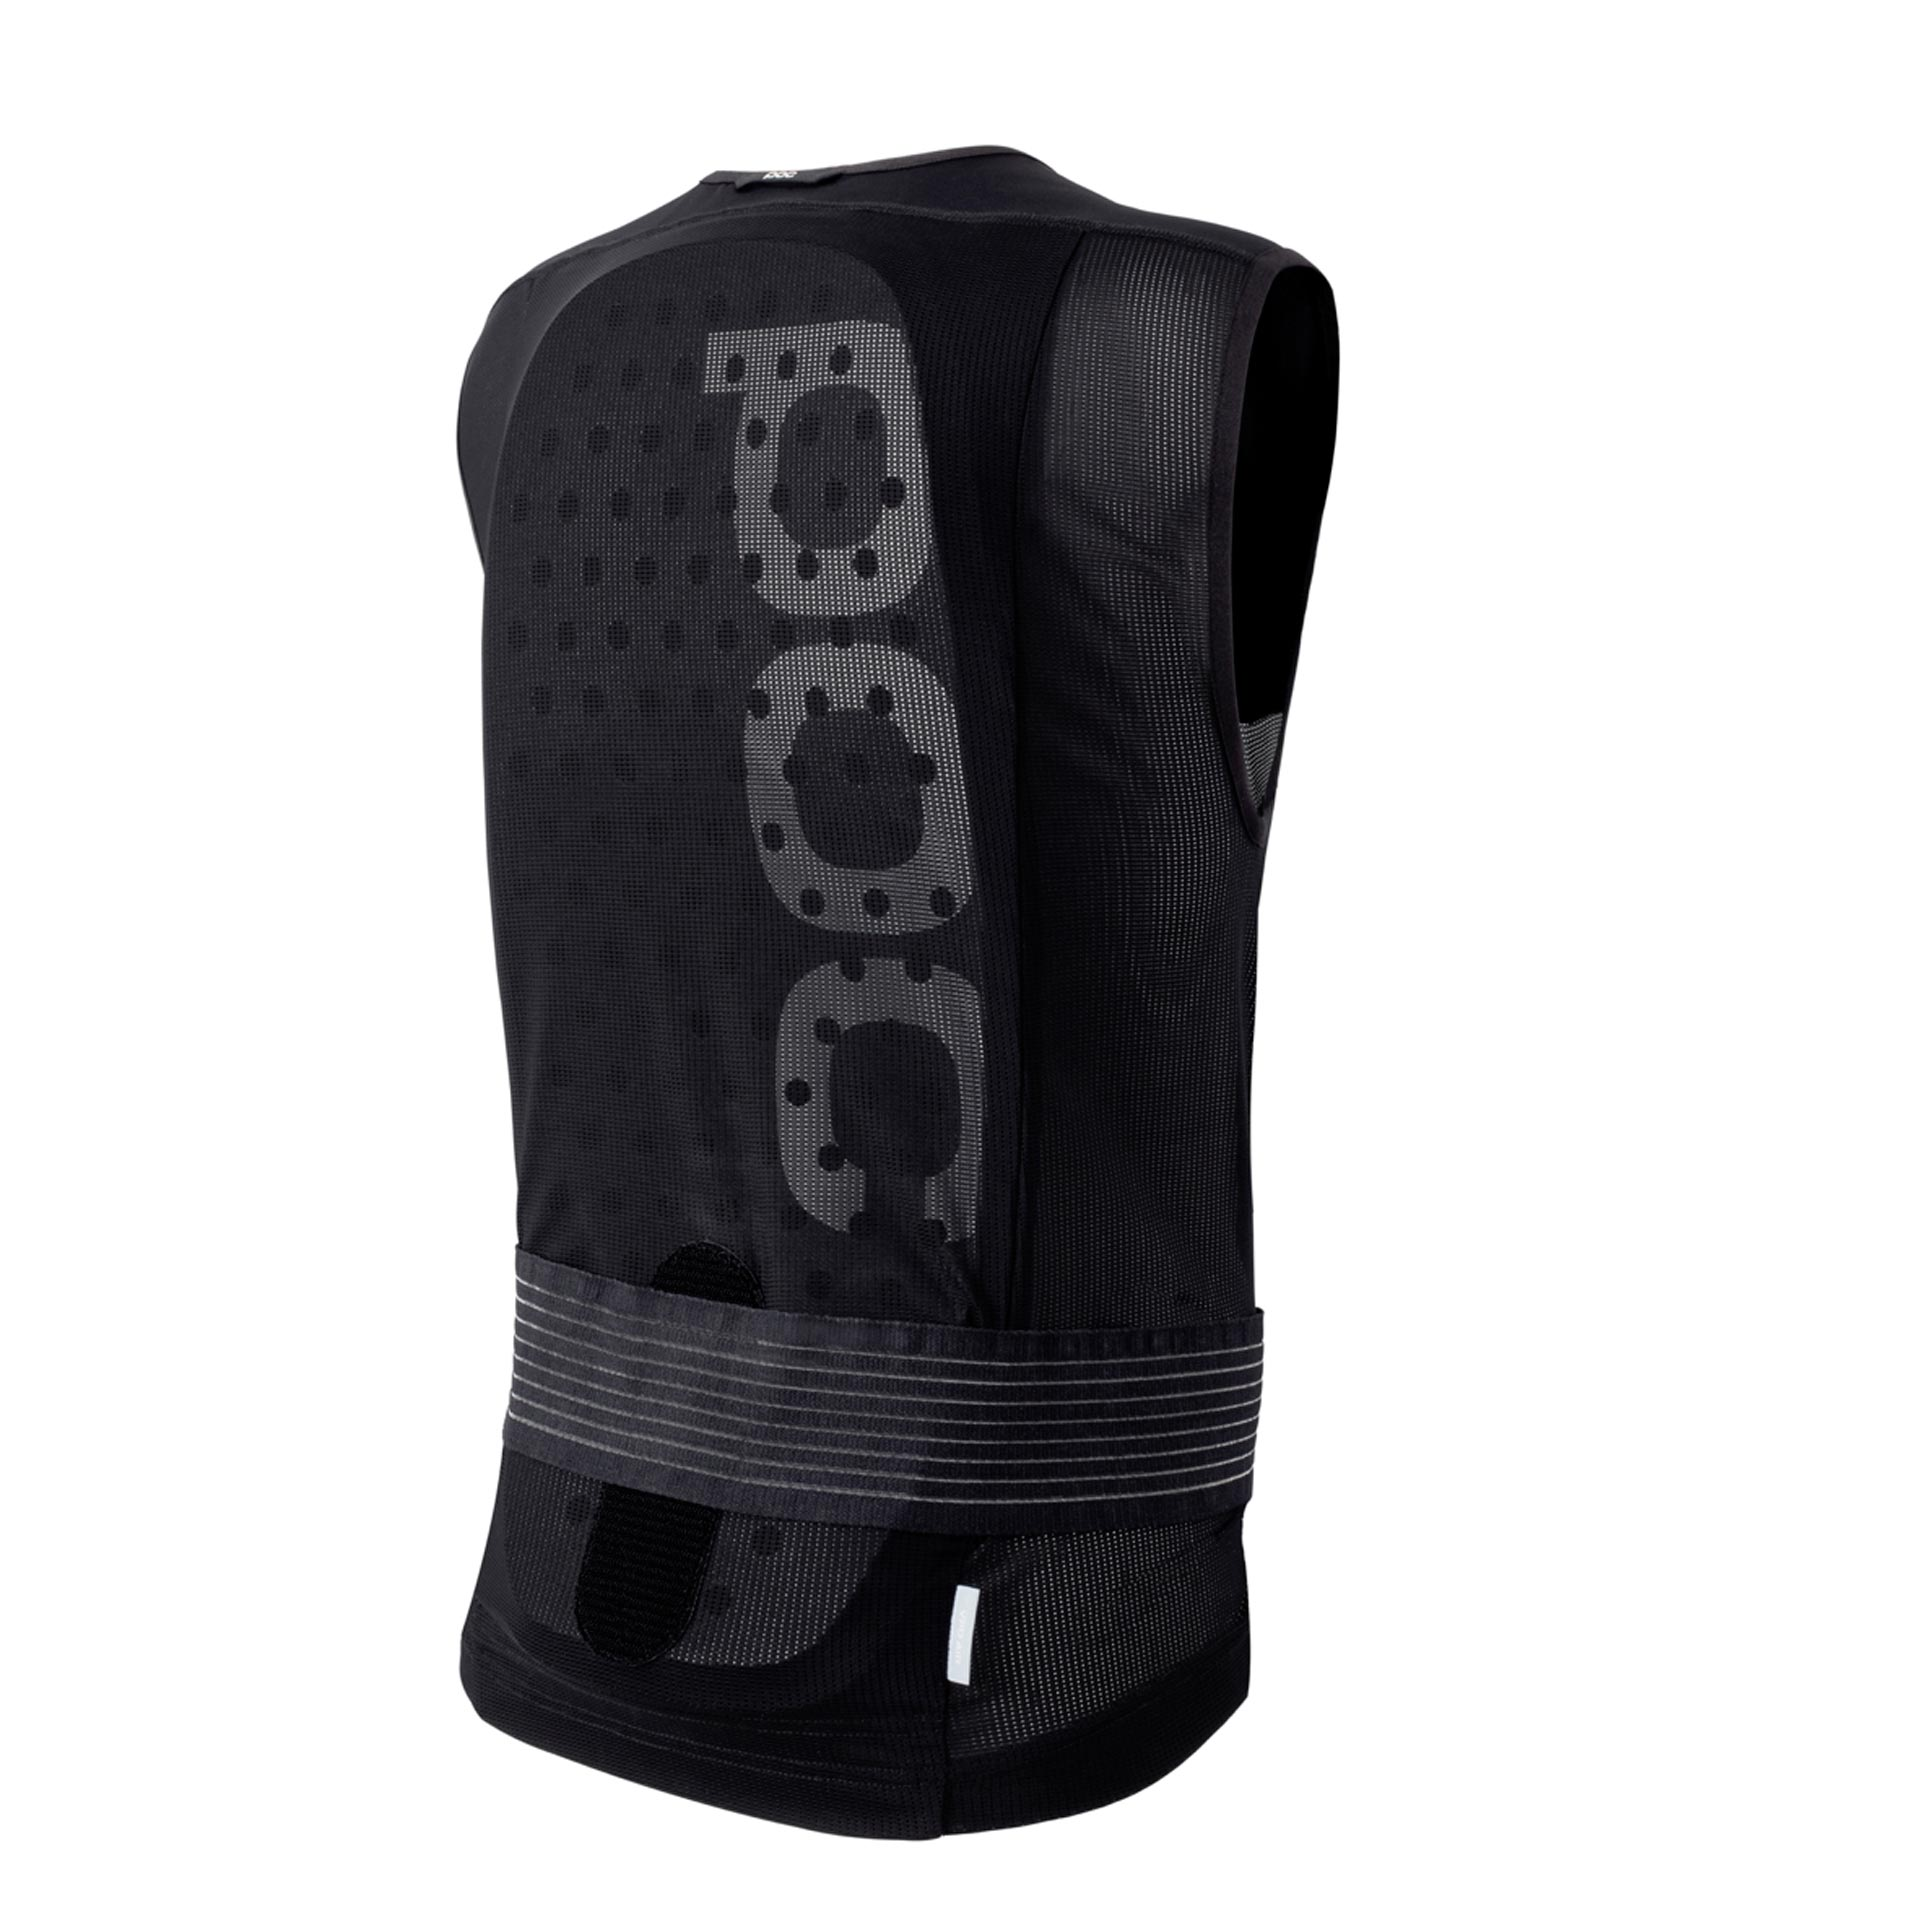 POC: Spine VPD Air Vest